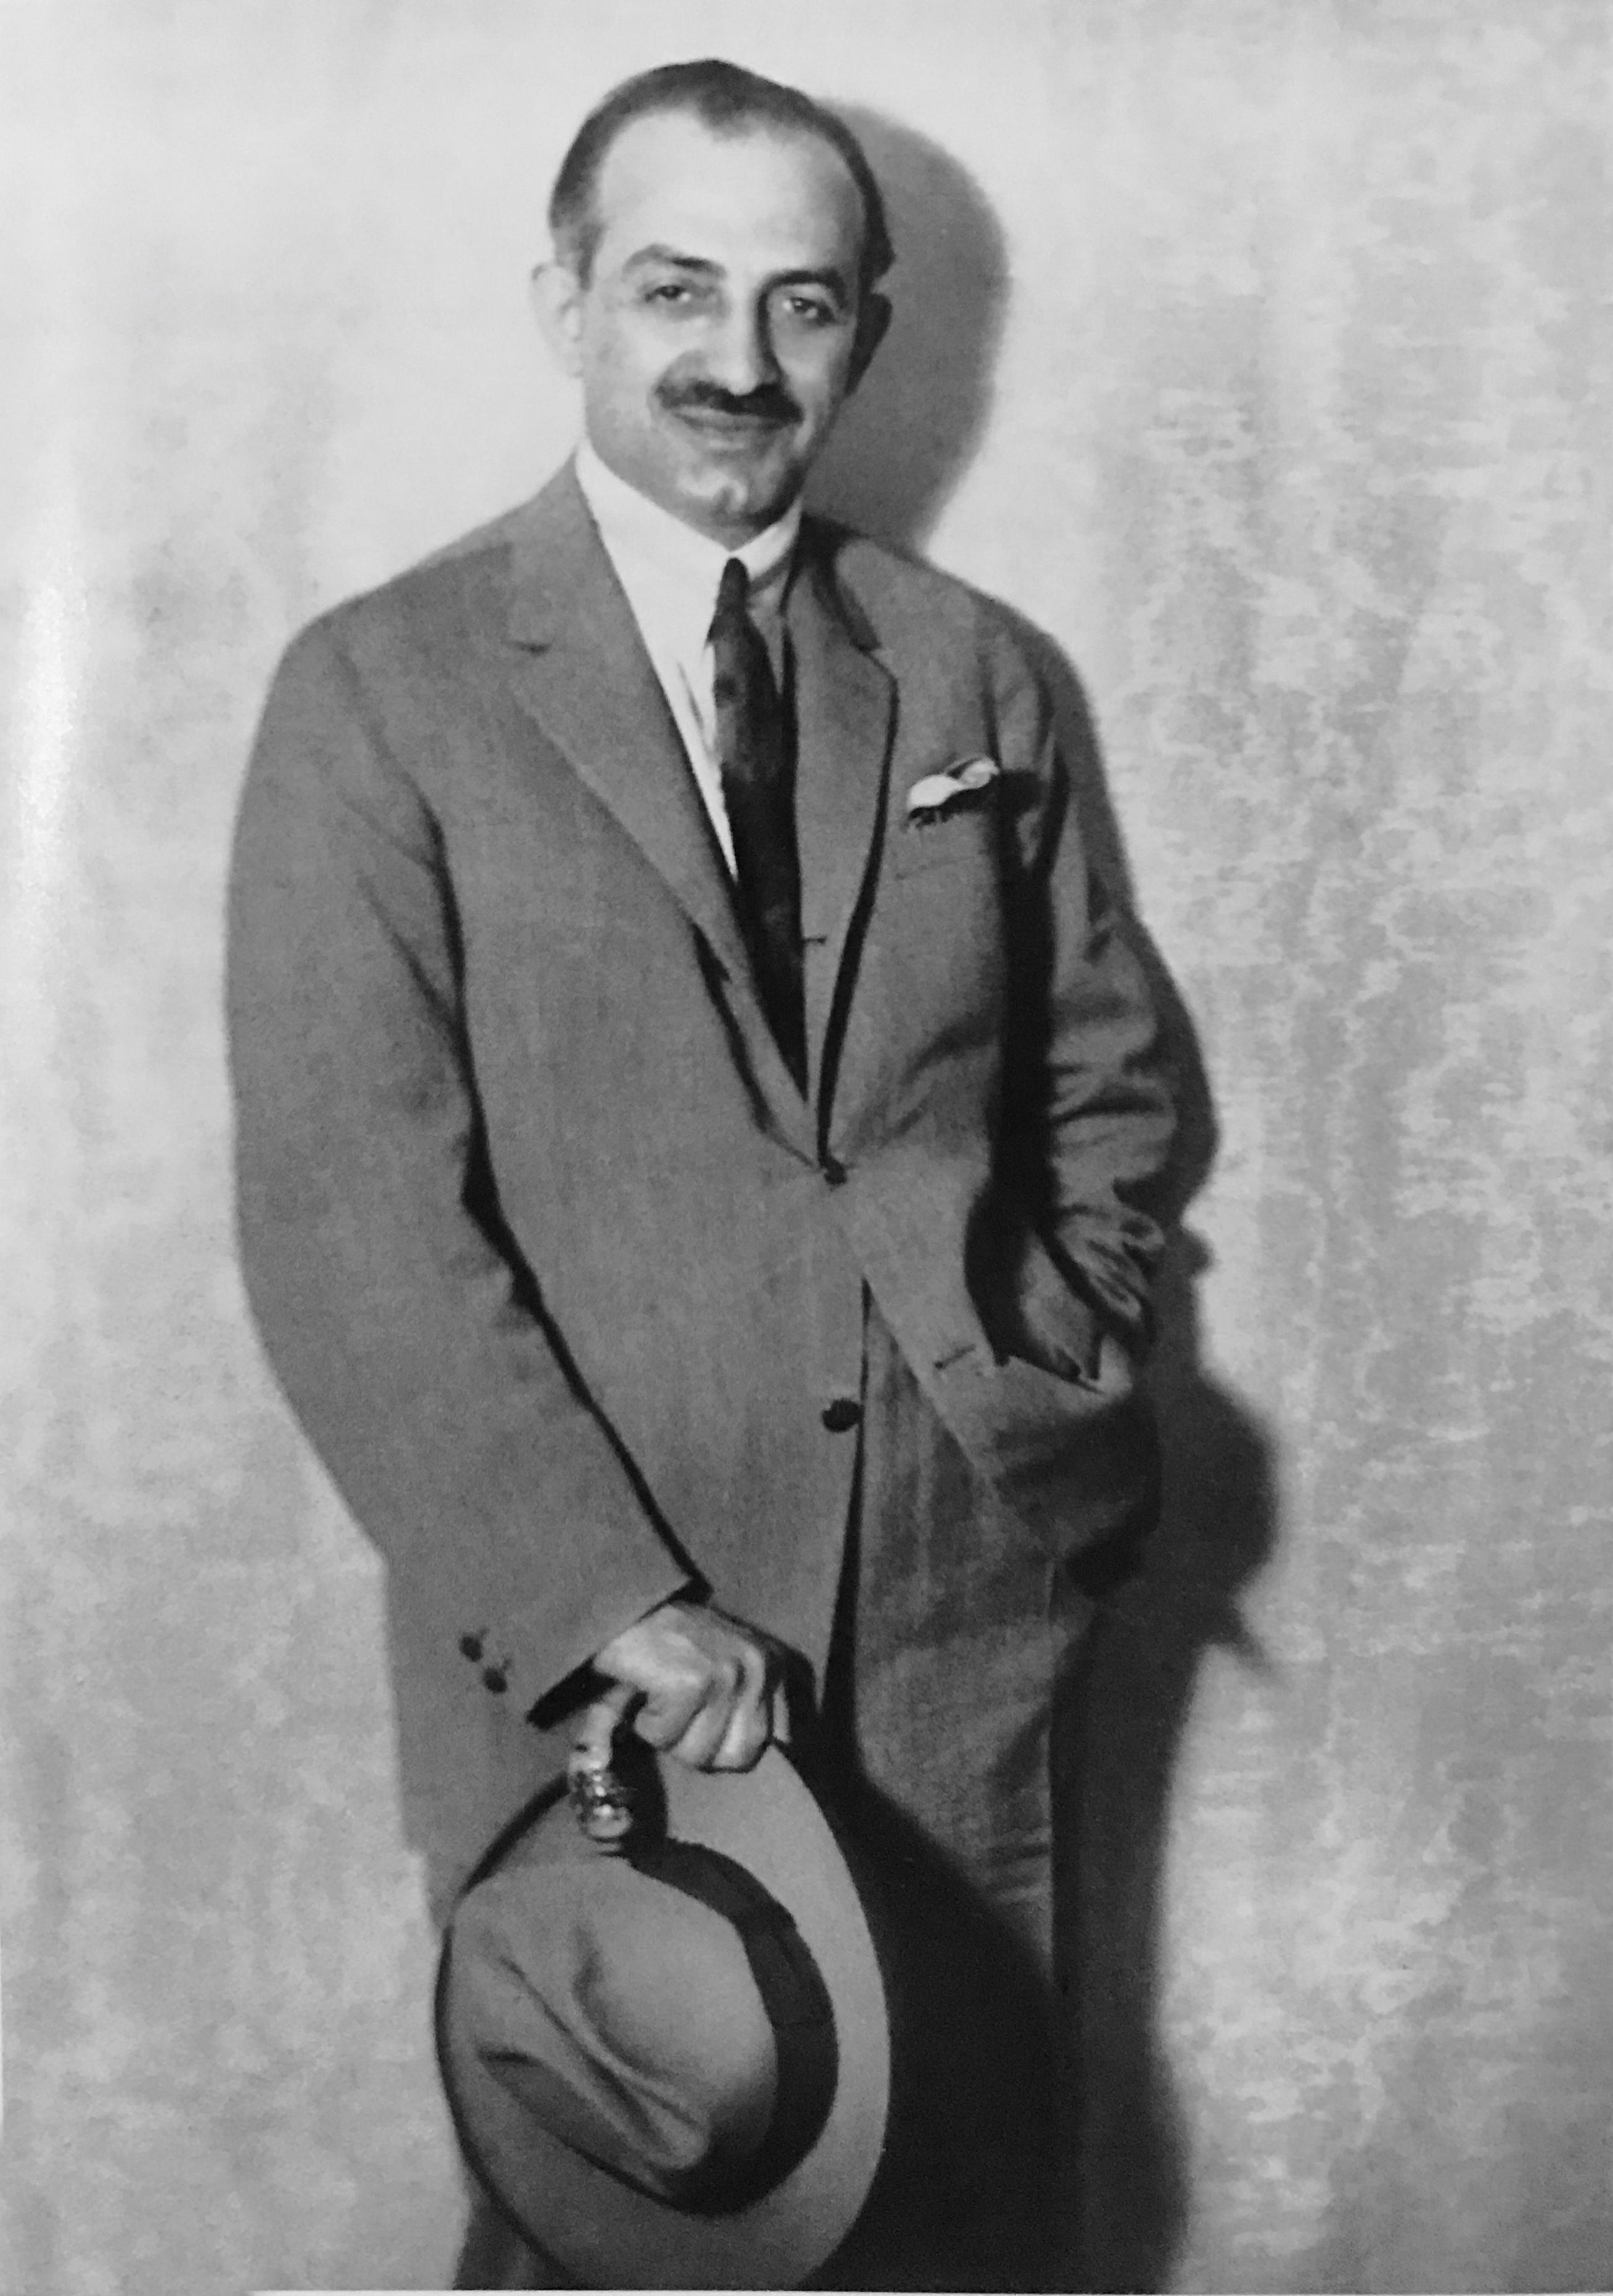 4e162e21bc Ο Δημήτριος Λαμπράκης ήταν δημοσιογράφος και εκδότης εφημερίδων. Υπηρέτησε  ως εθελοντής στον Μακεδονικό Αγώνα και τους Βαλκανικούς Πολέμους.